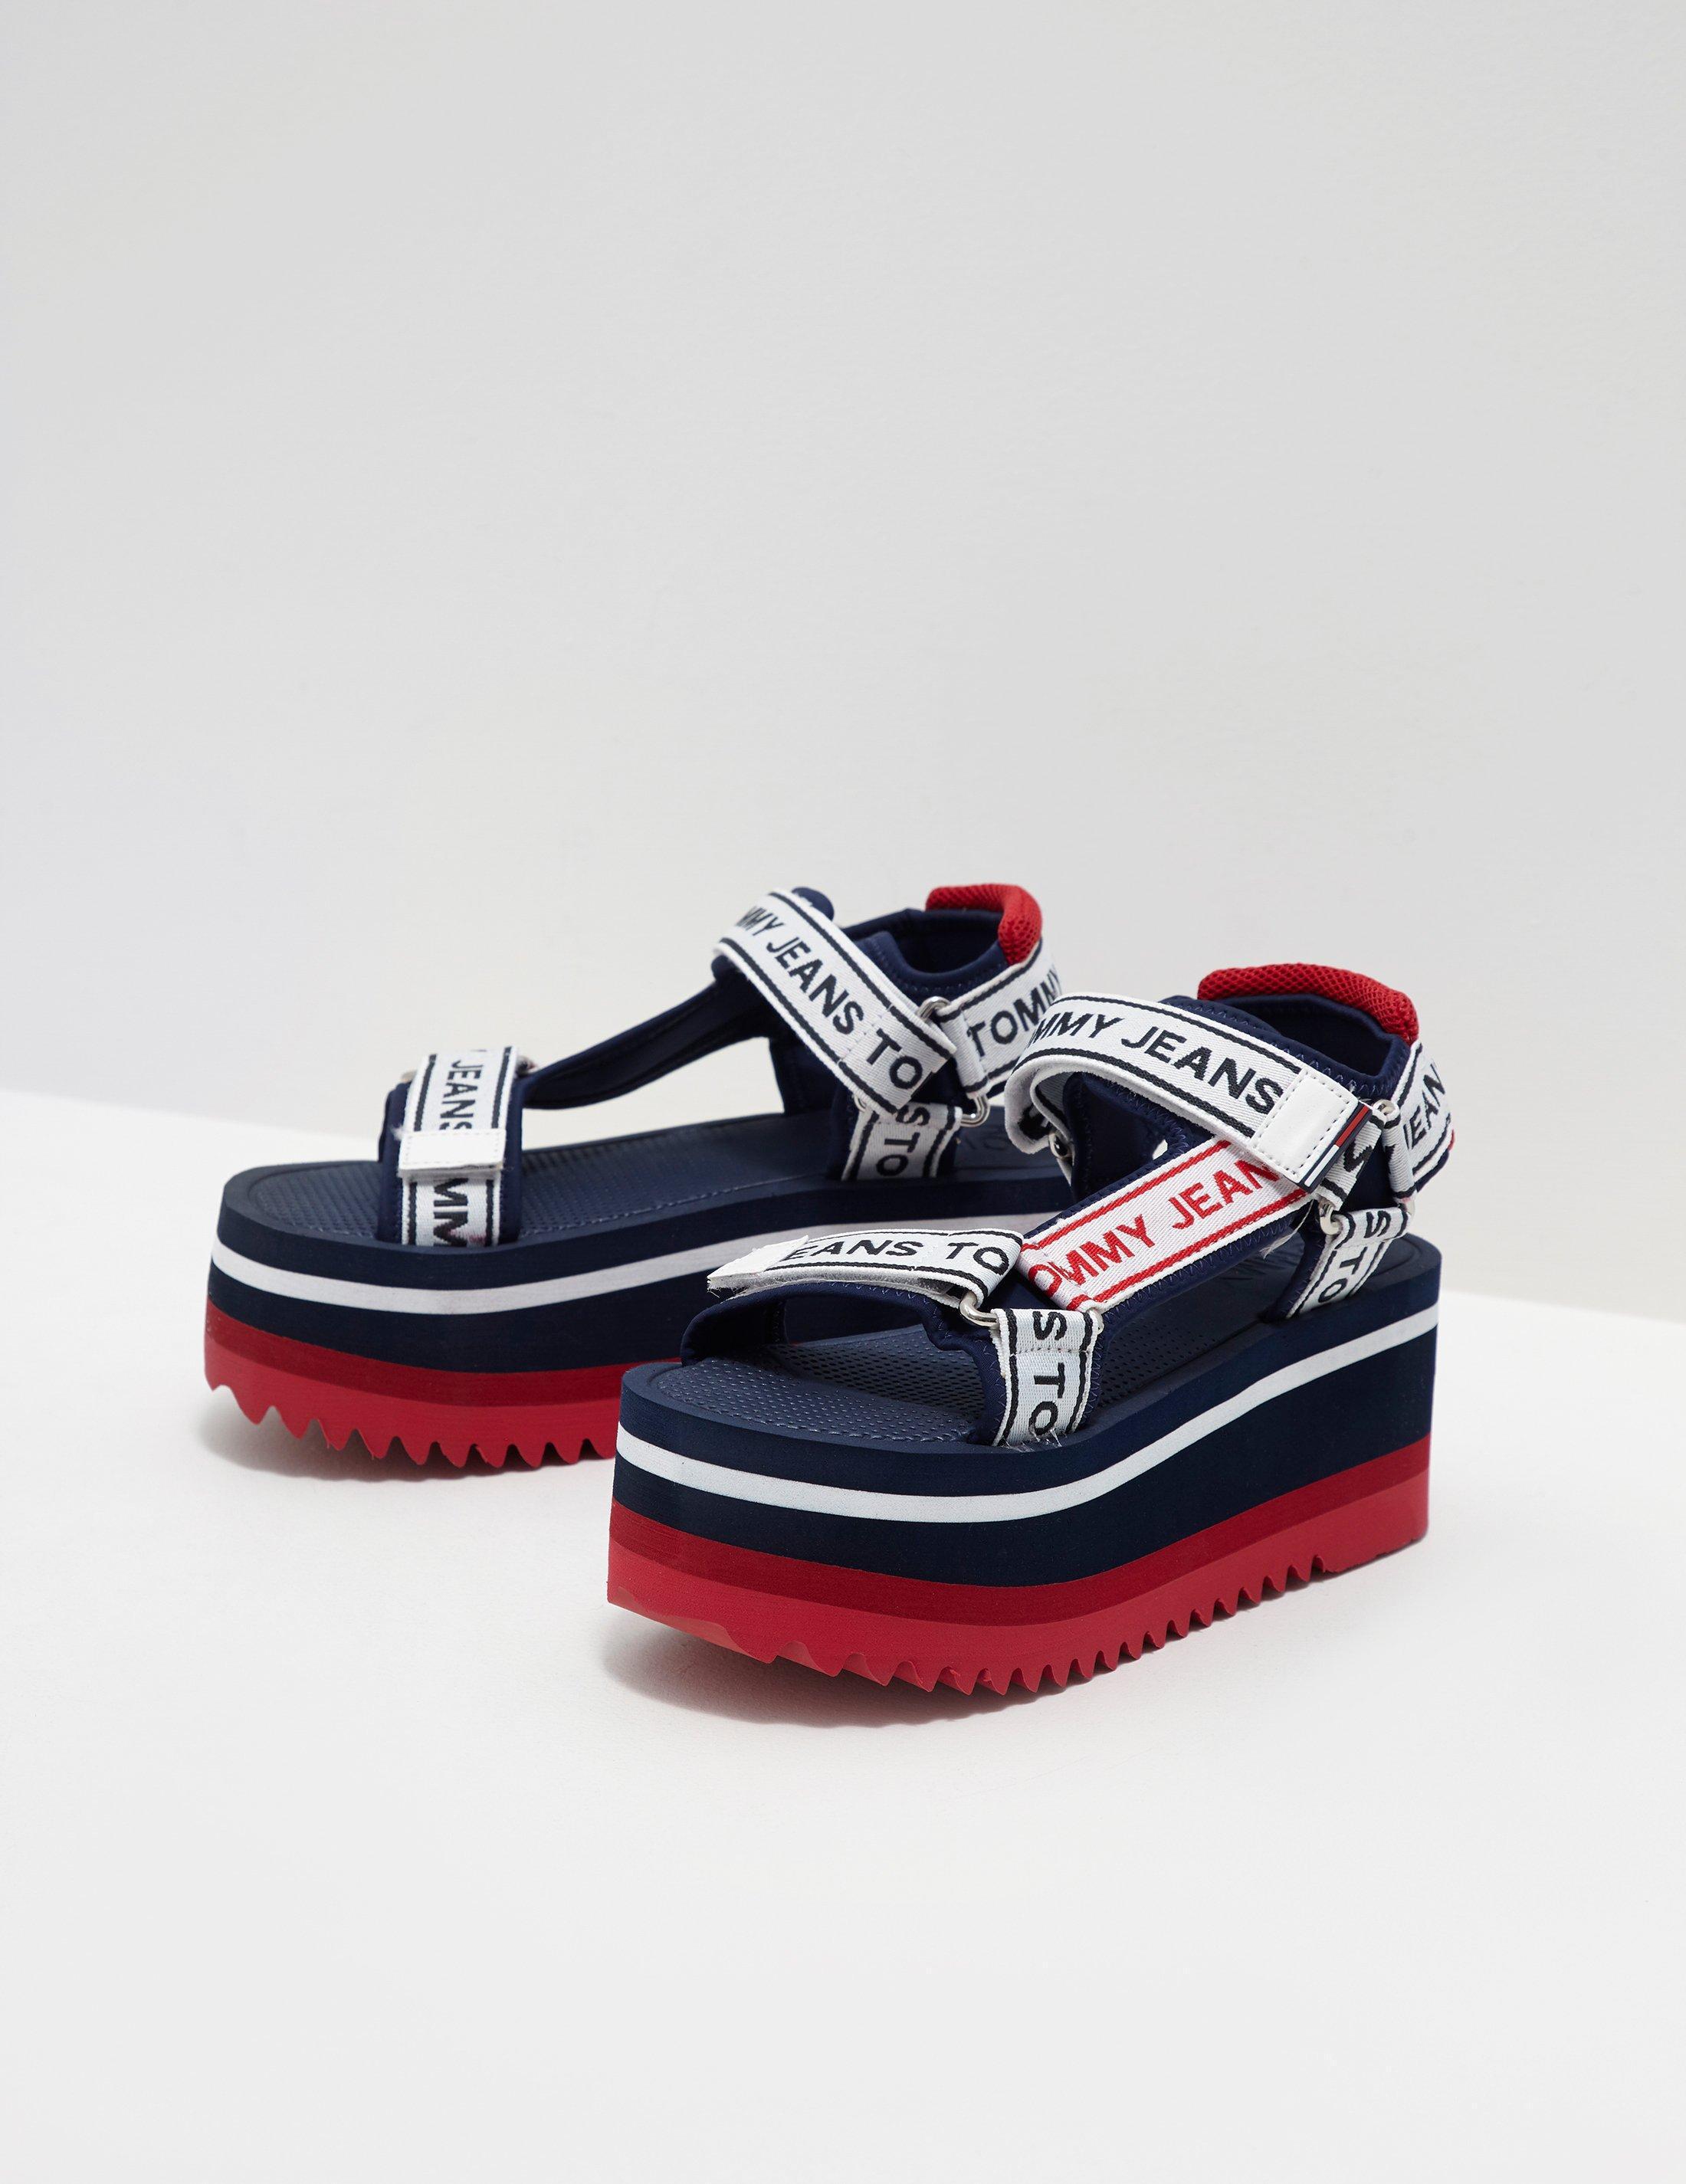 00d87f6c3 Lyst - Tommy Hilfiger Womens Technical Platform Sandals Navy Blue in ...